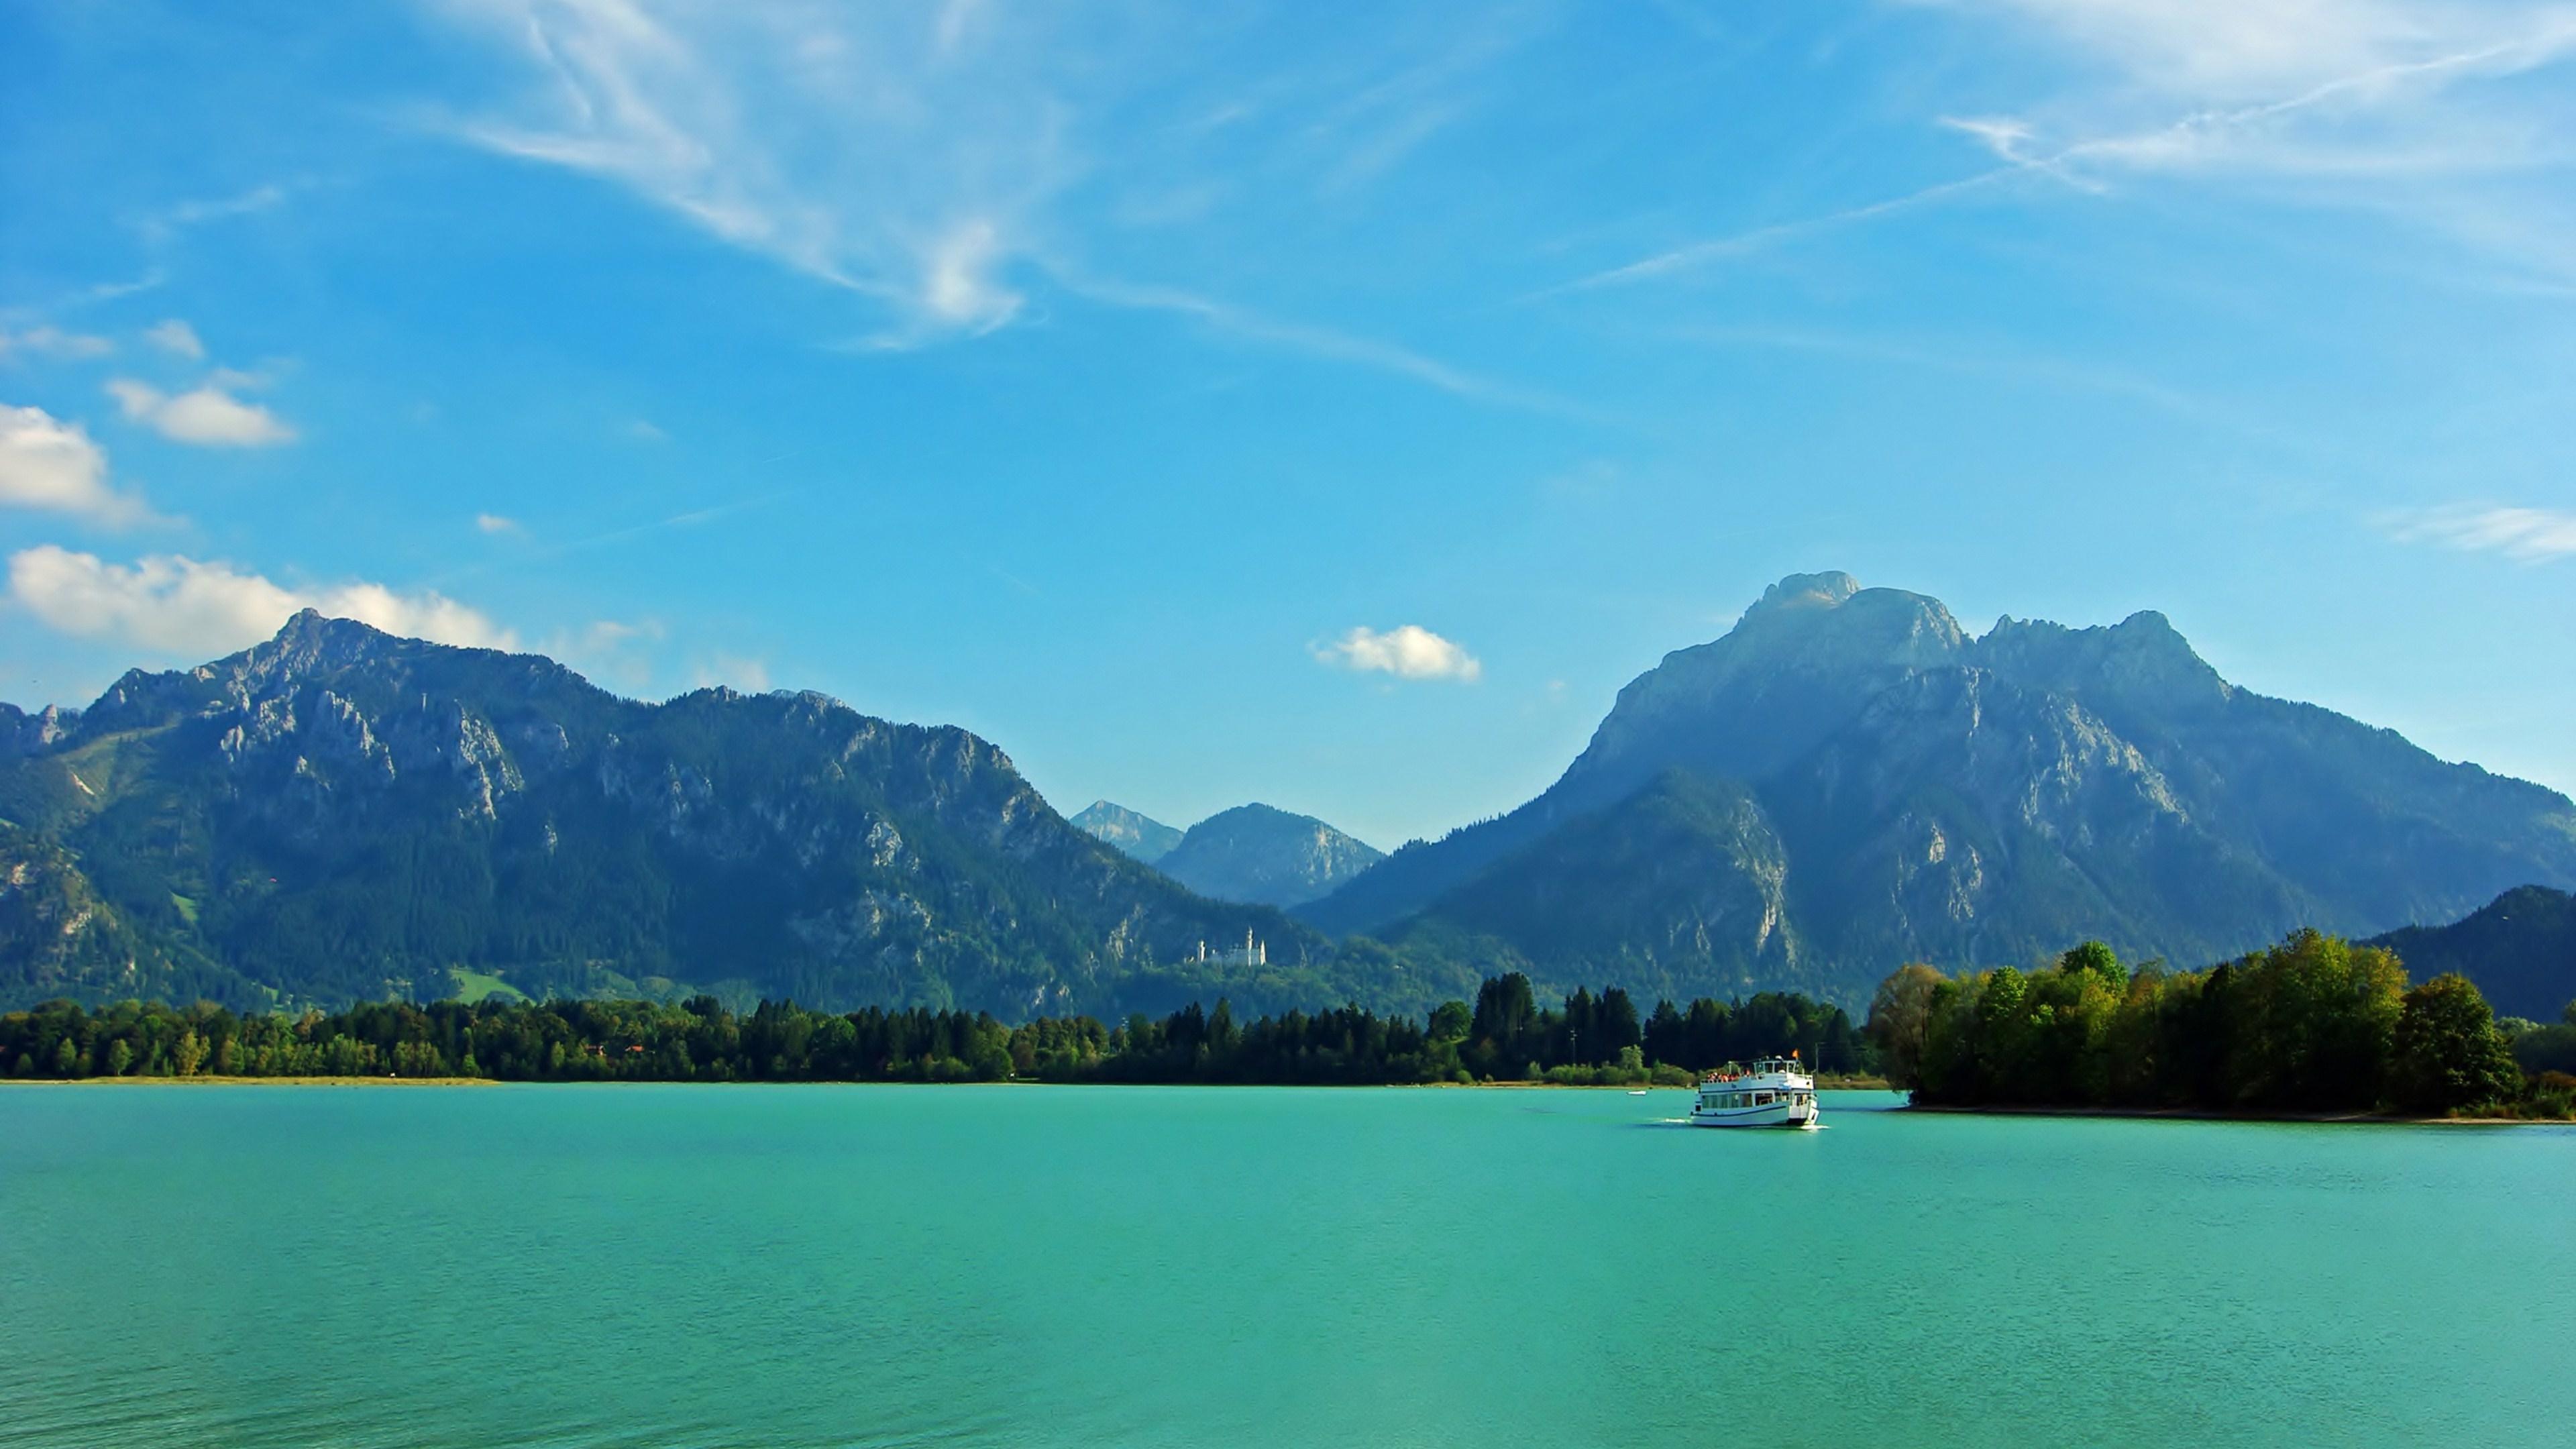 Alpsee Lake (Bavaria) wallpaper